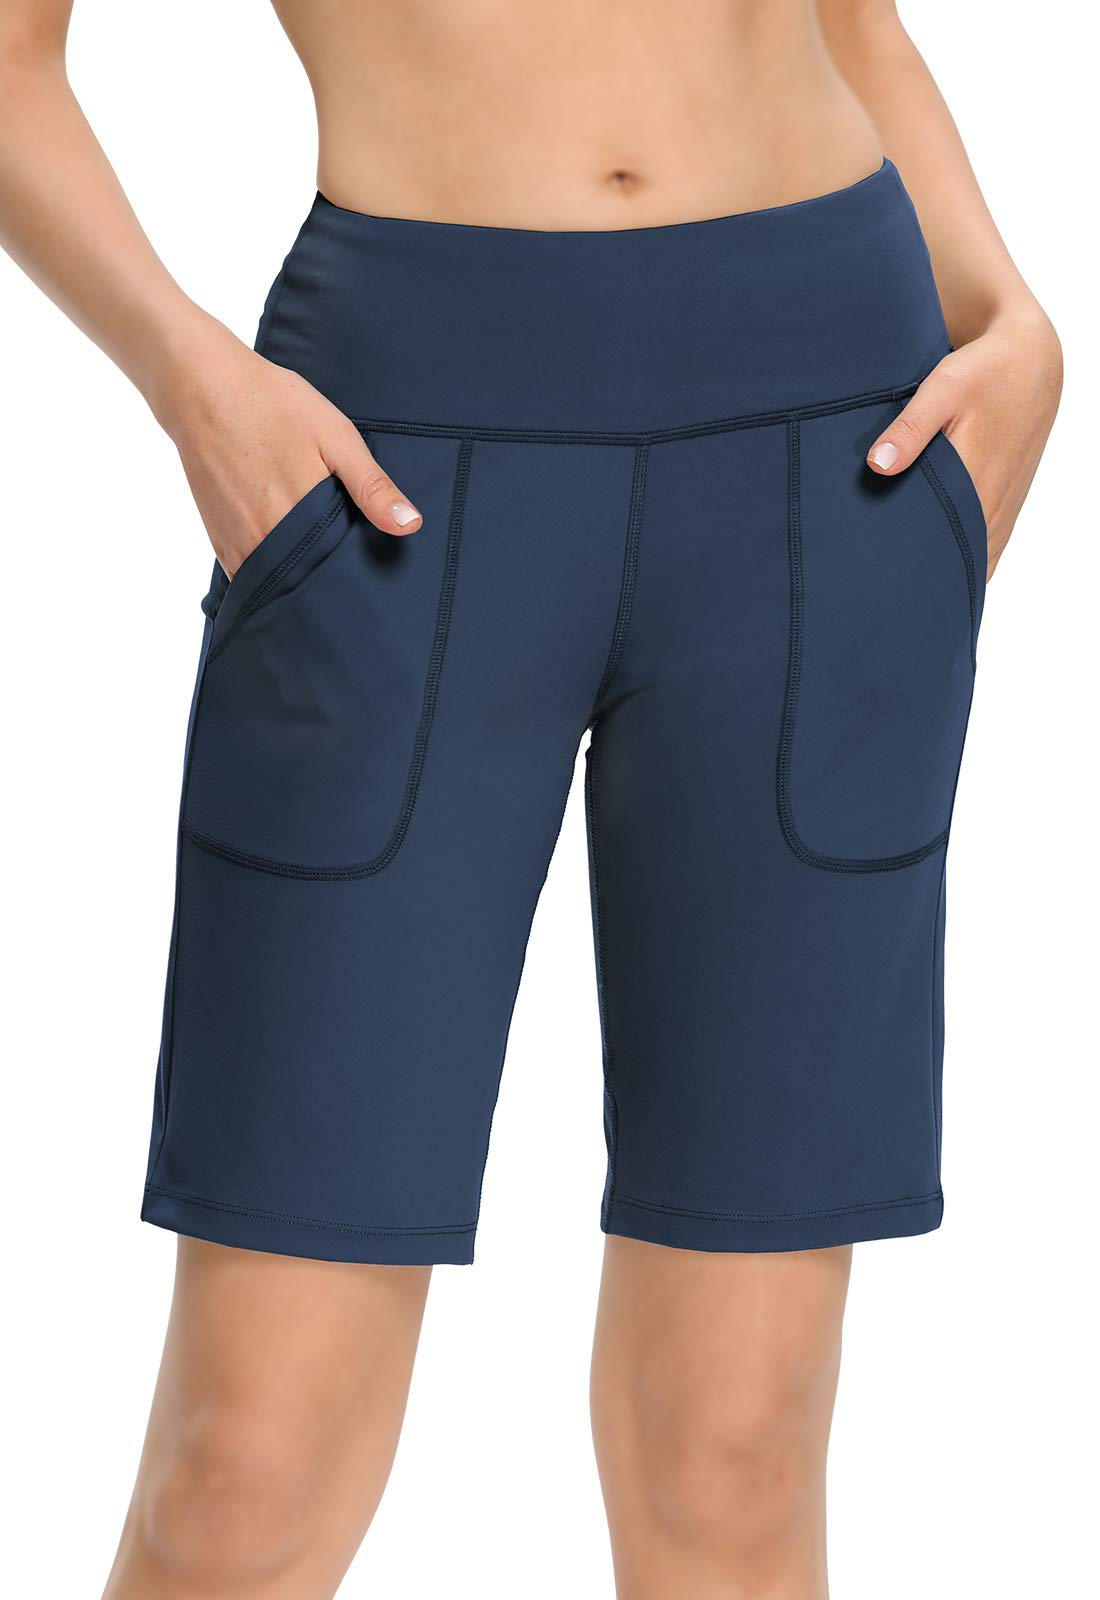 "MOCOLY Women's 10"" Yoga Workout Shorts Lounge Bermuda Shorts Loose Leg High Waist Athletic Training Running Shorts"